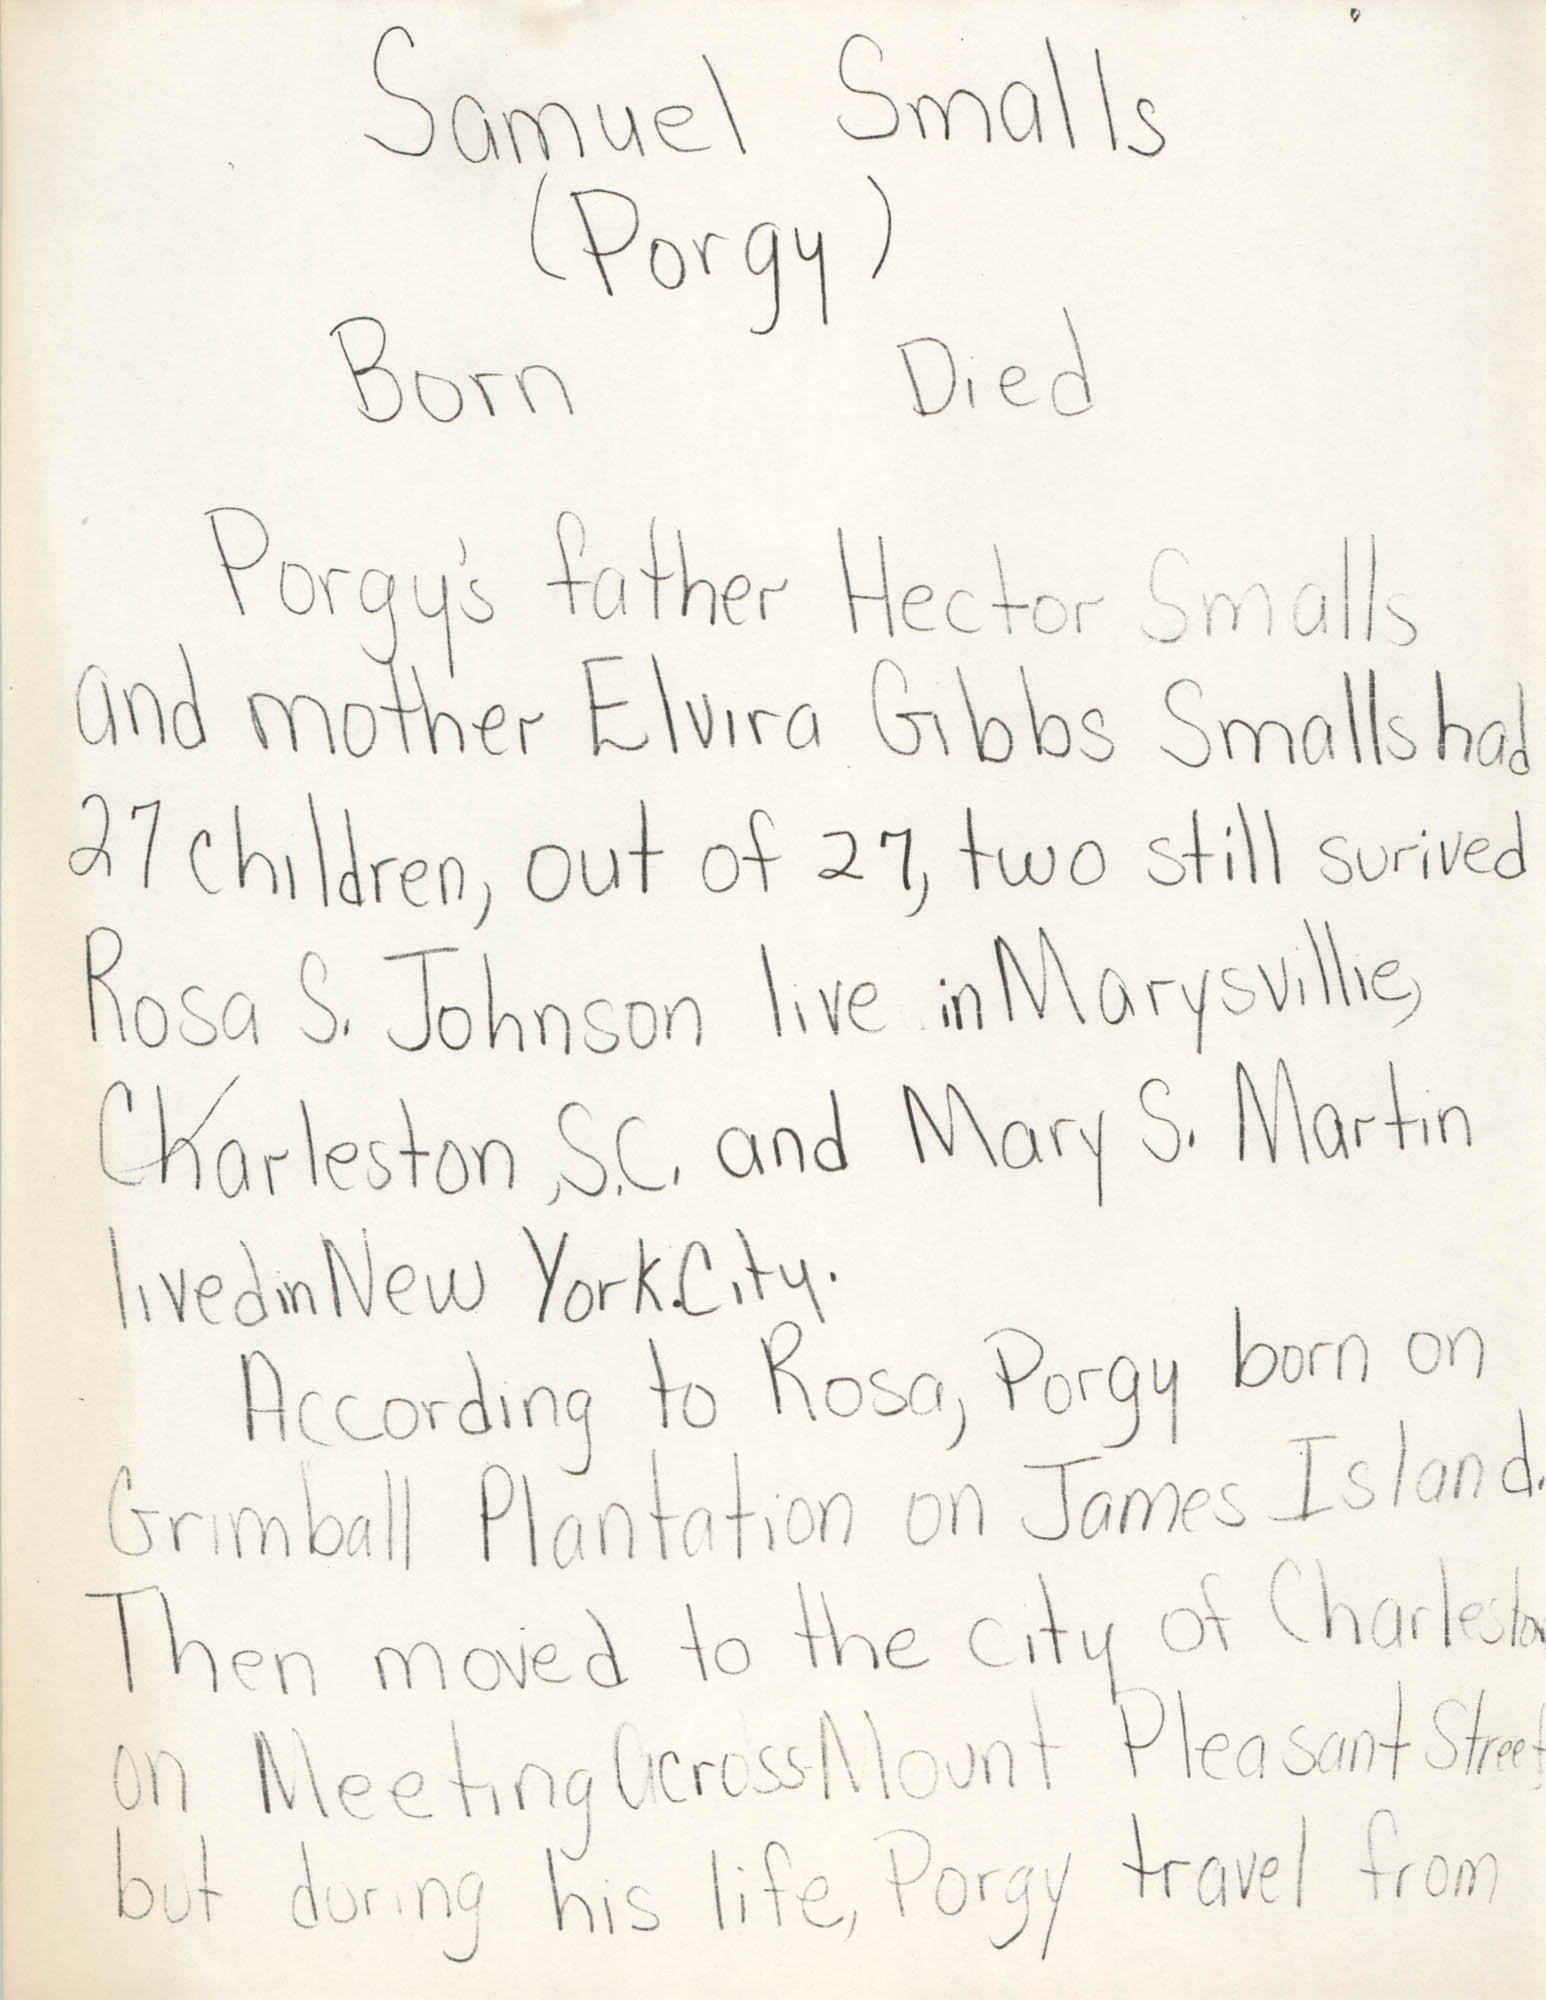 Samuel Smalls Biography, Page 1